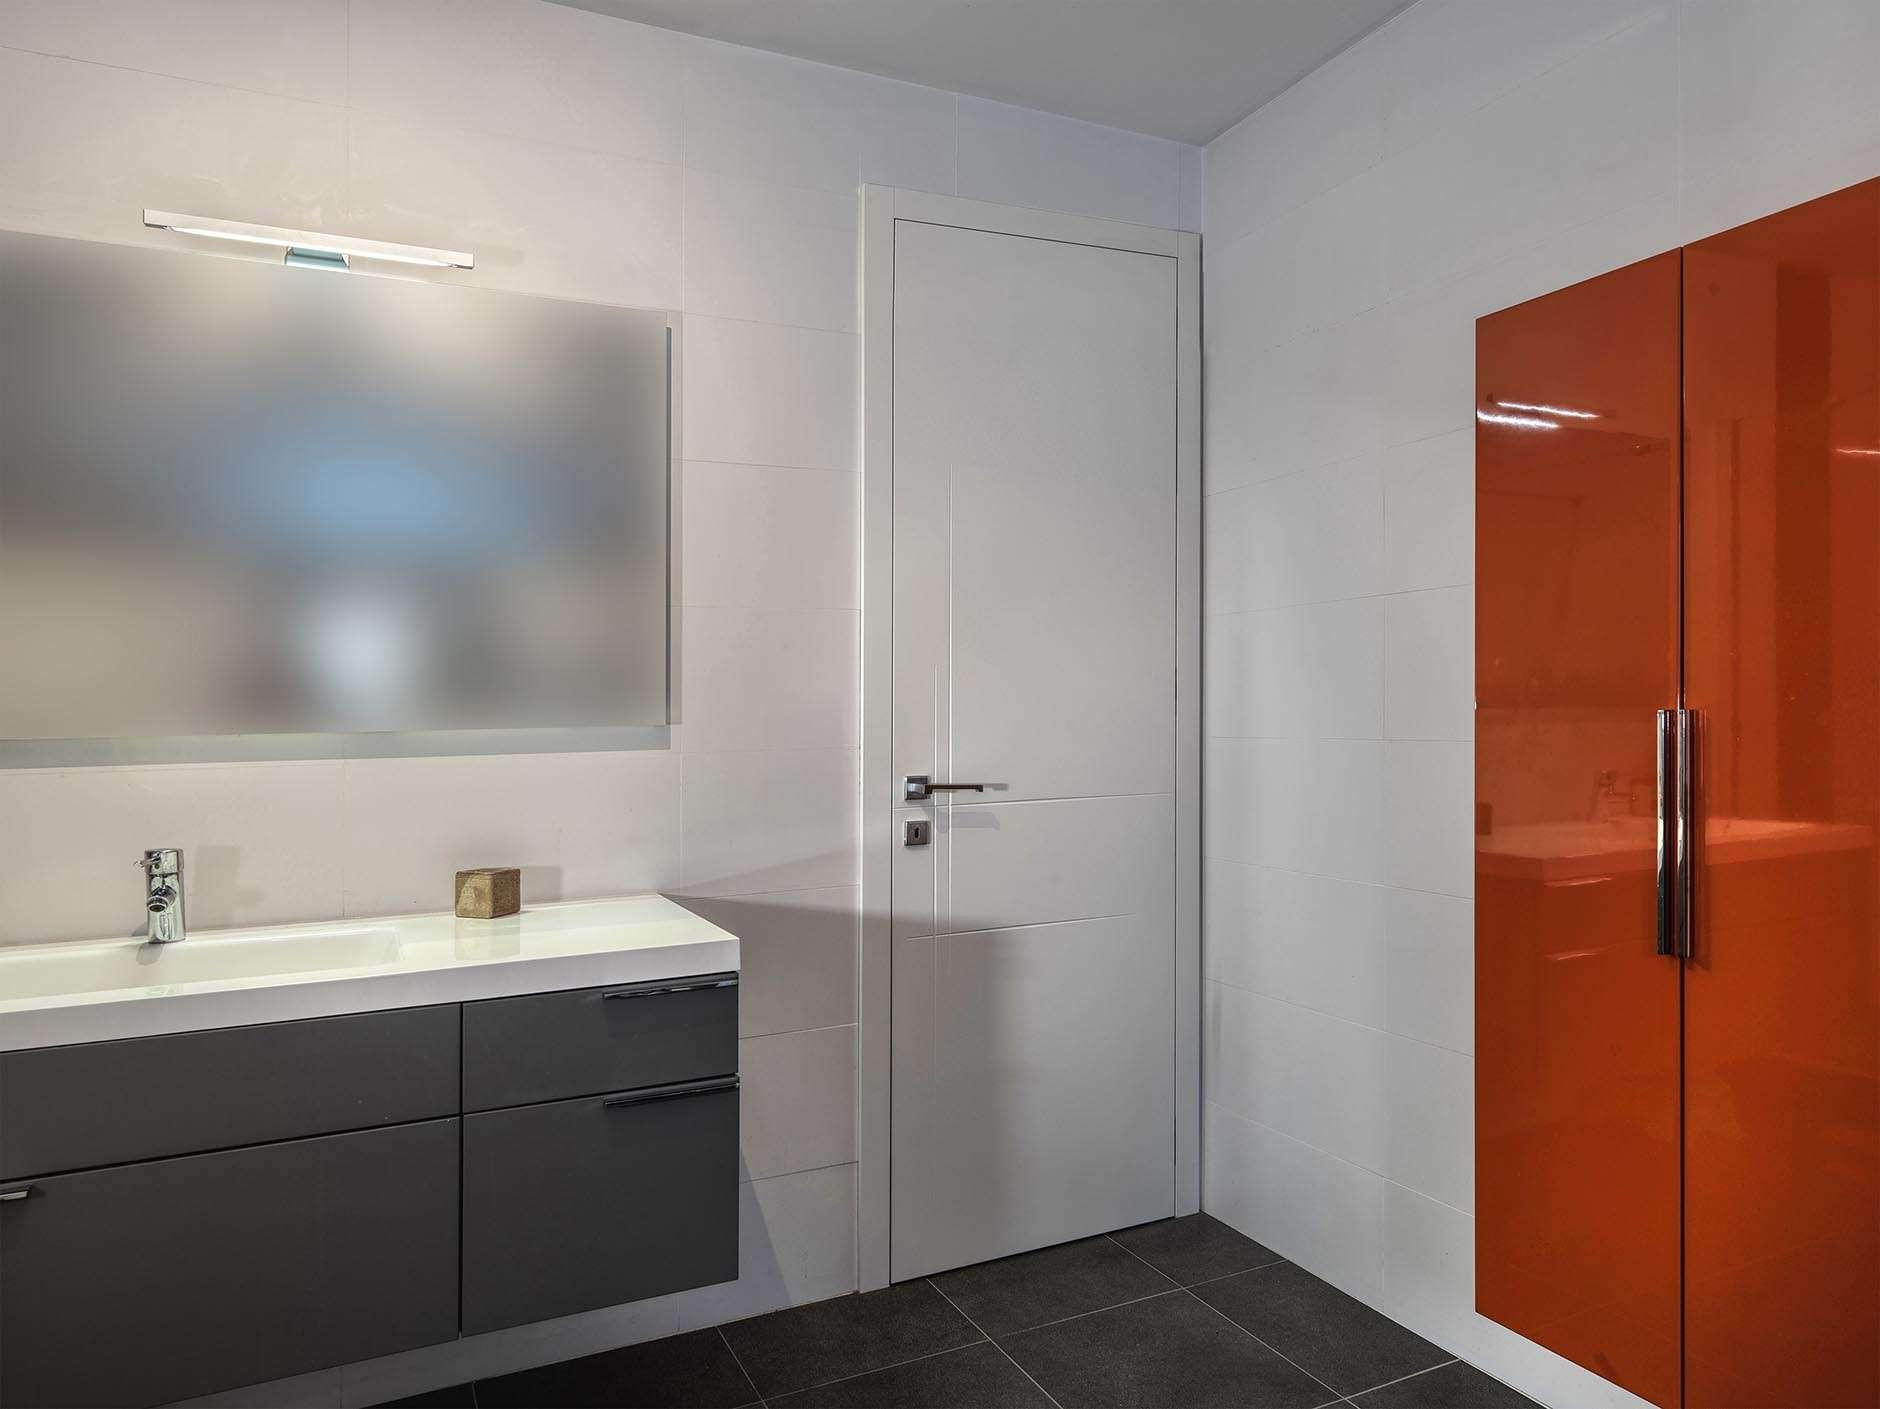 badkamerdeur-wit-gelakt-strak